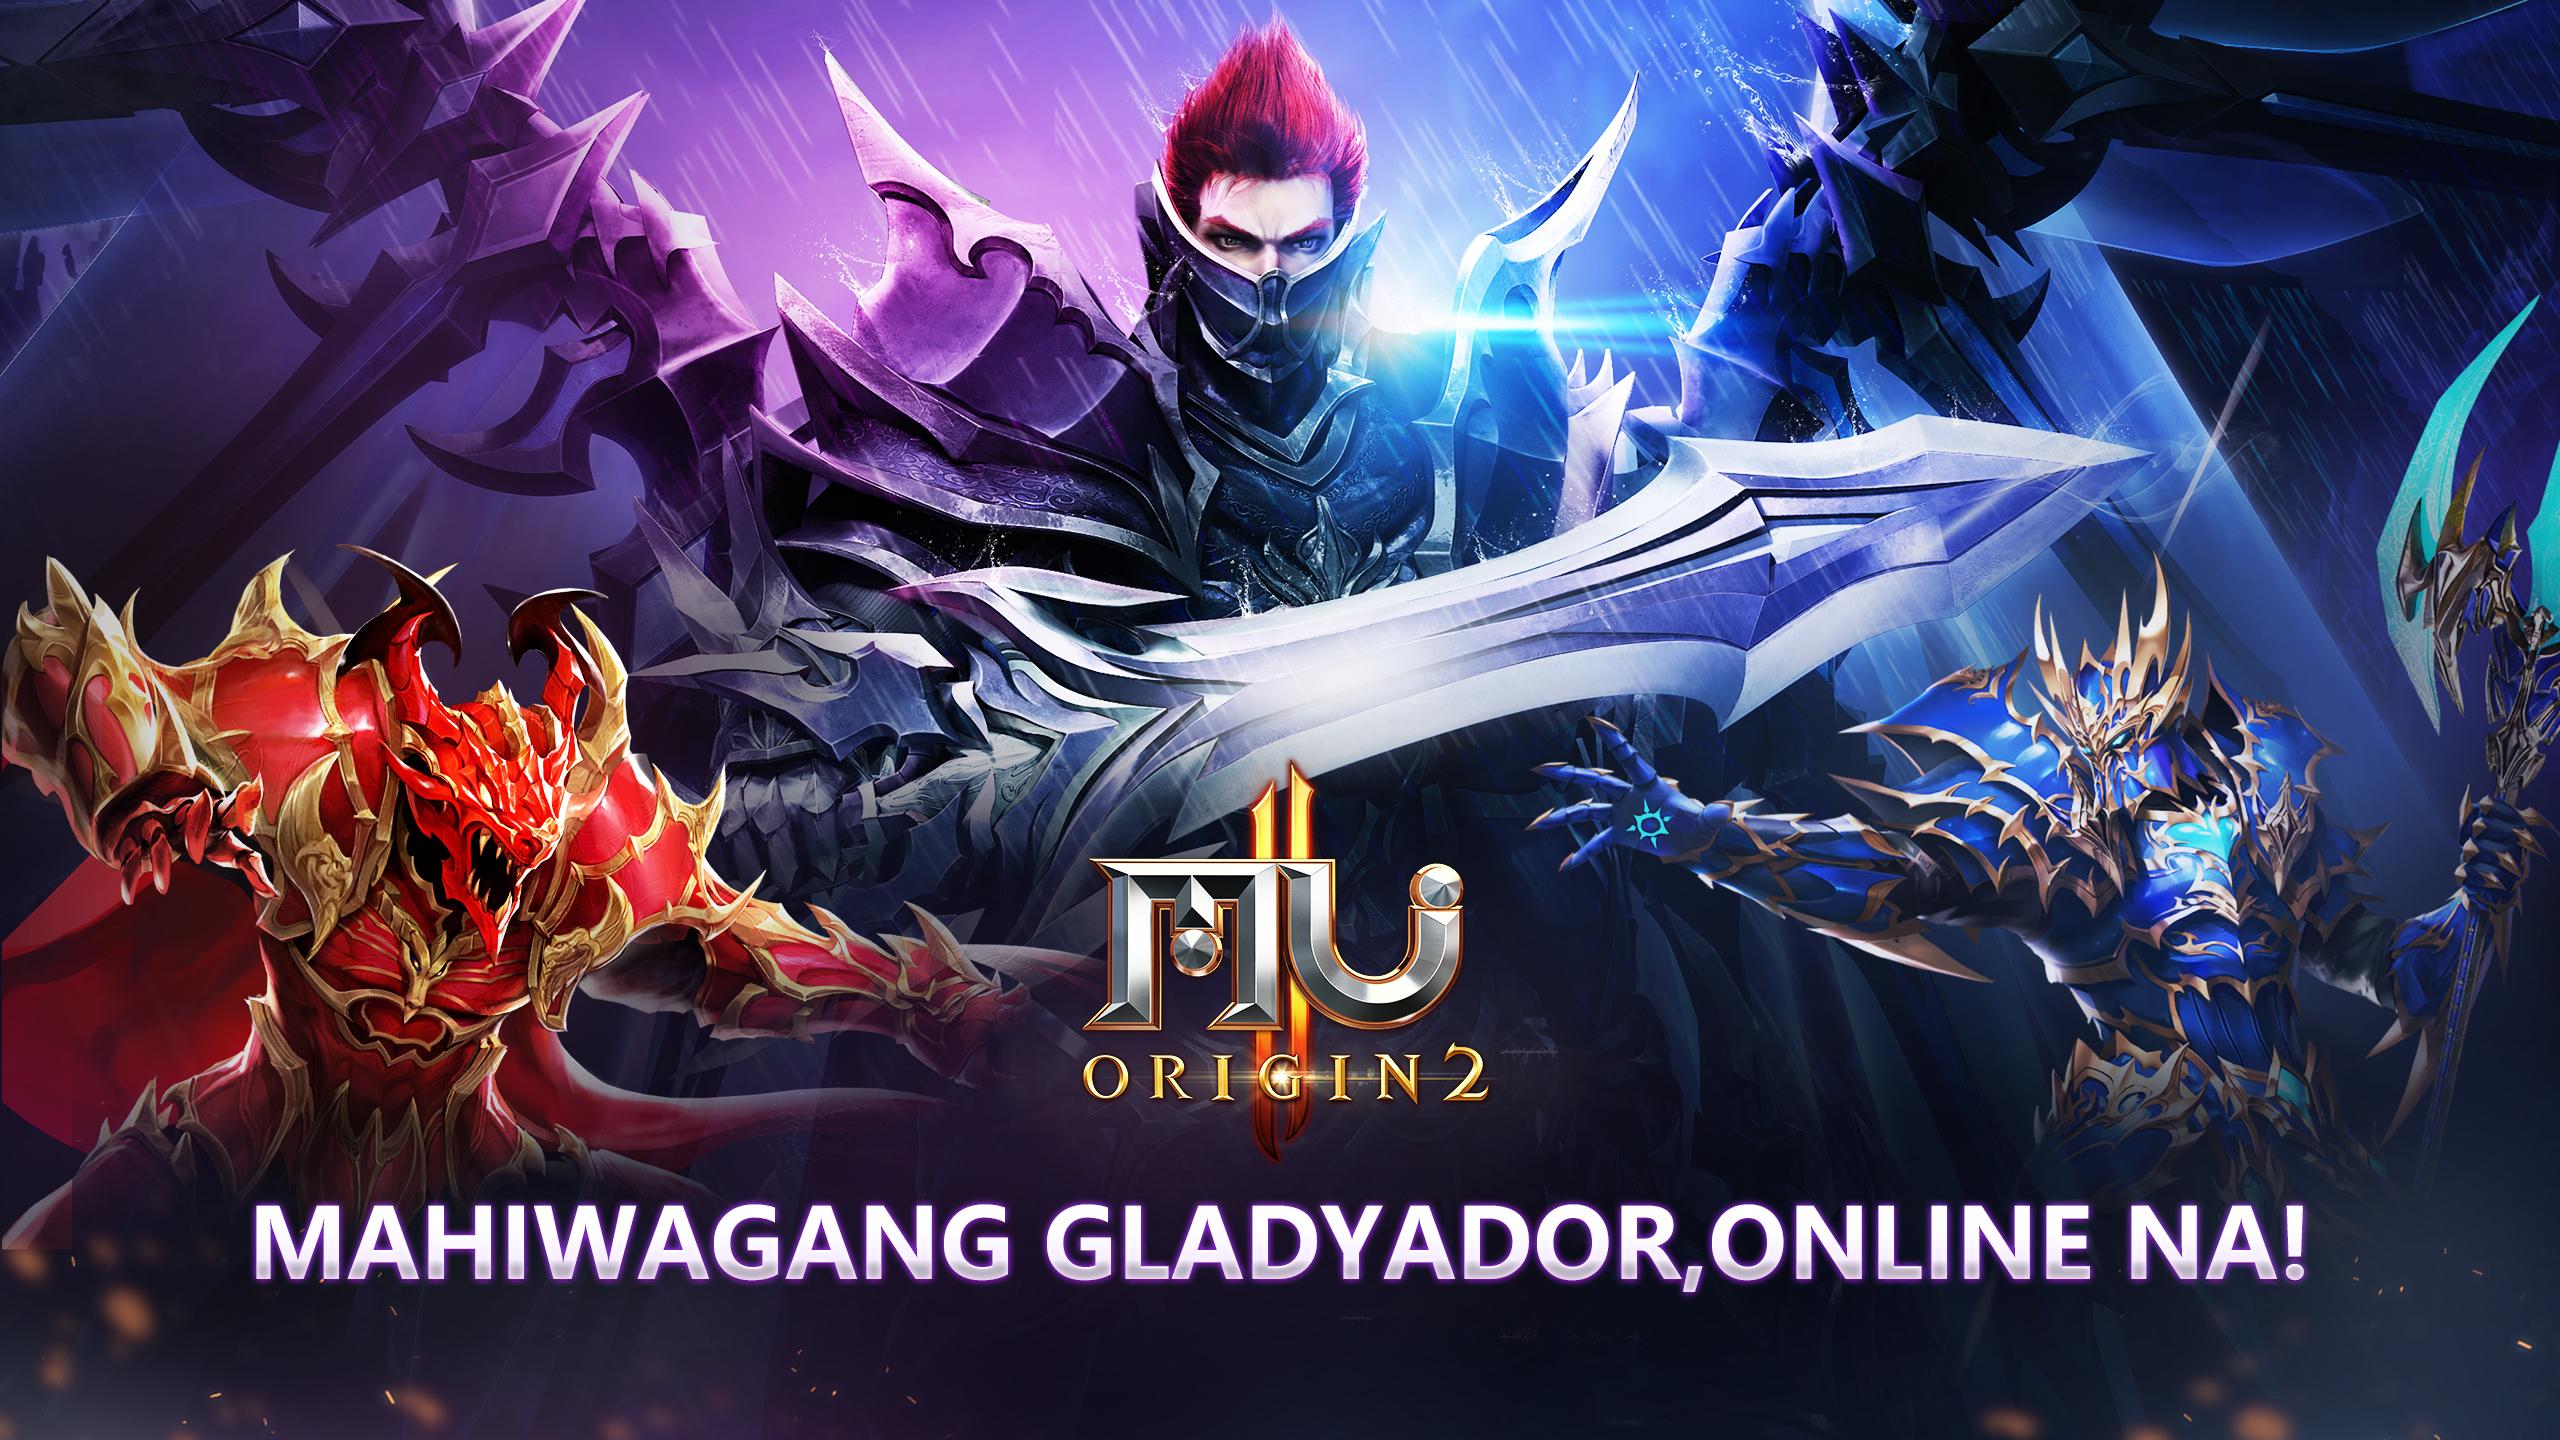 MU Origin 2 New PH Version is Finally Here! – GamingPH com